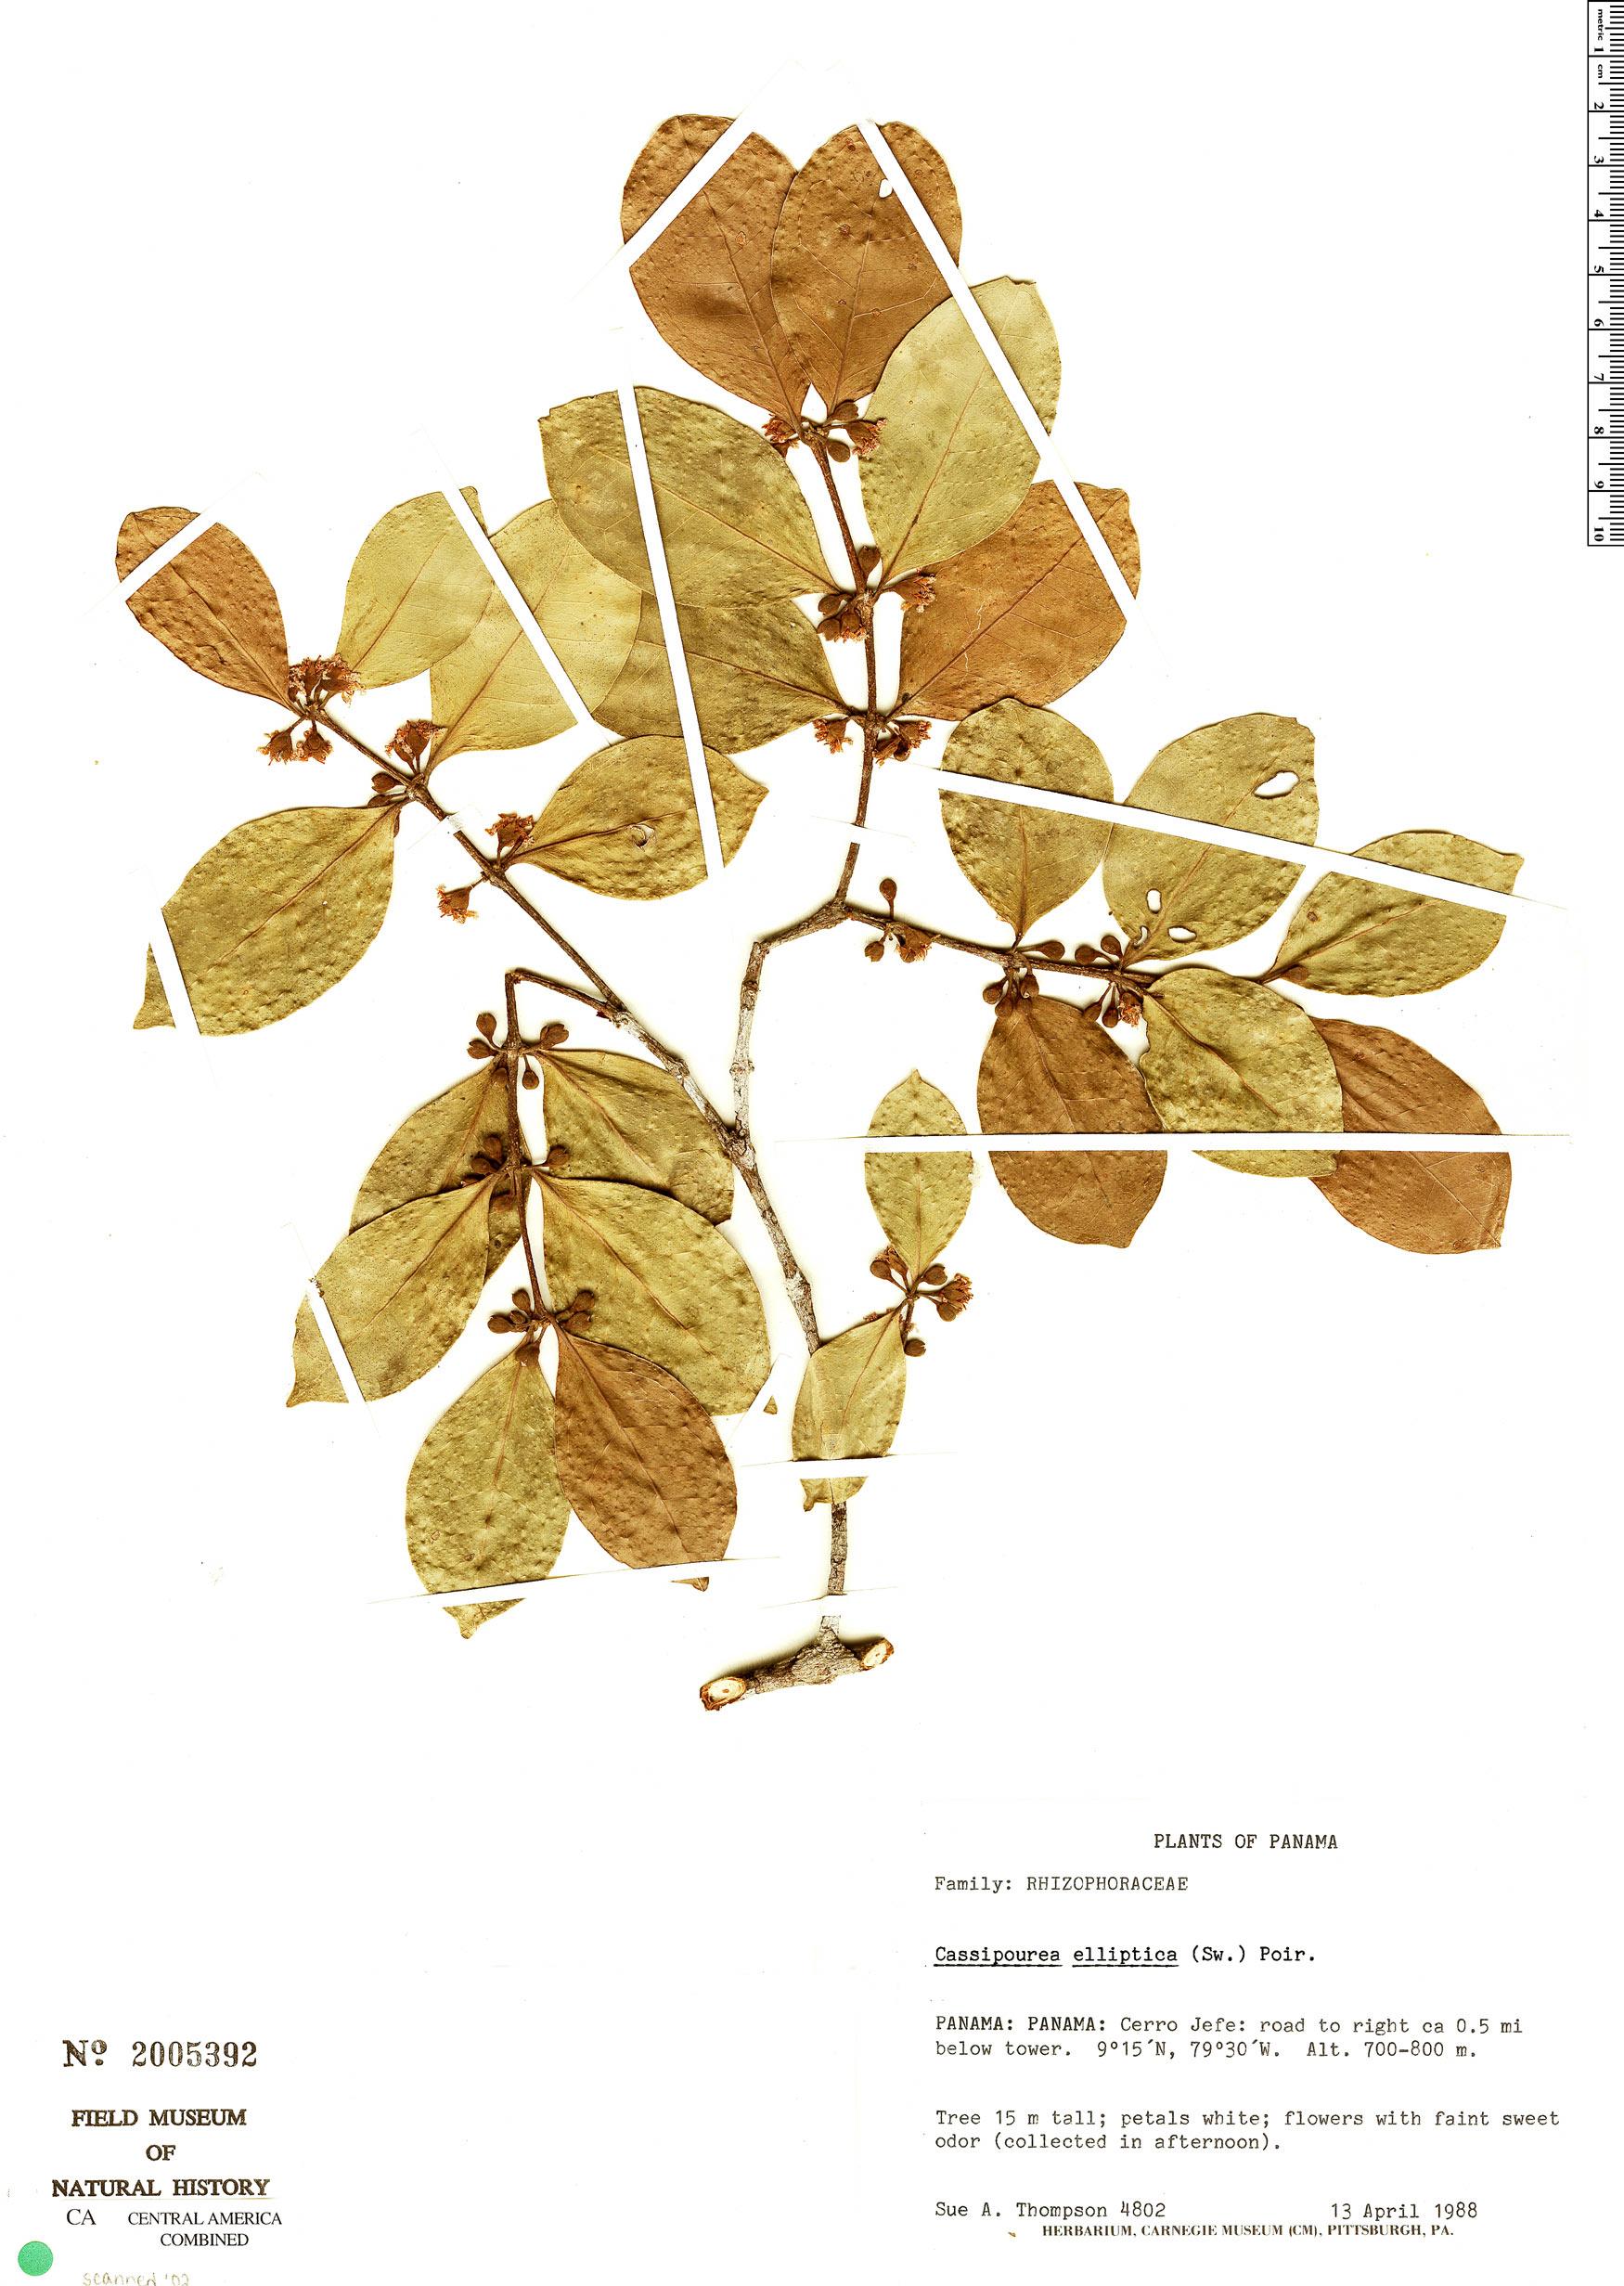 Cassipourea elliptica image